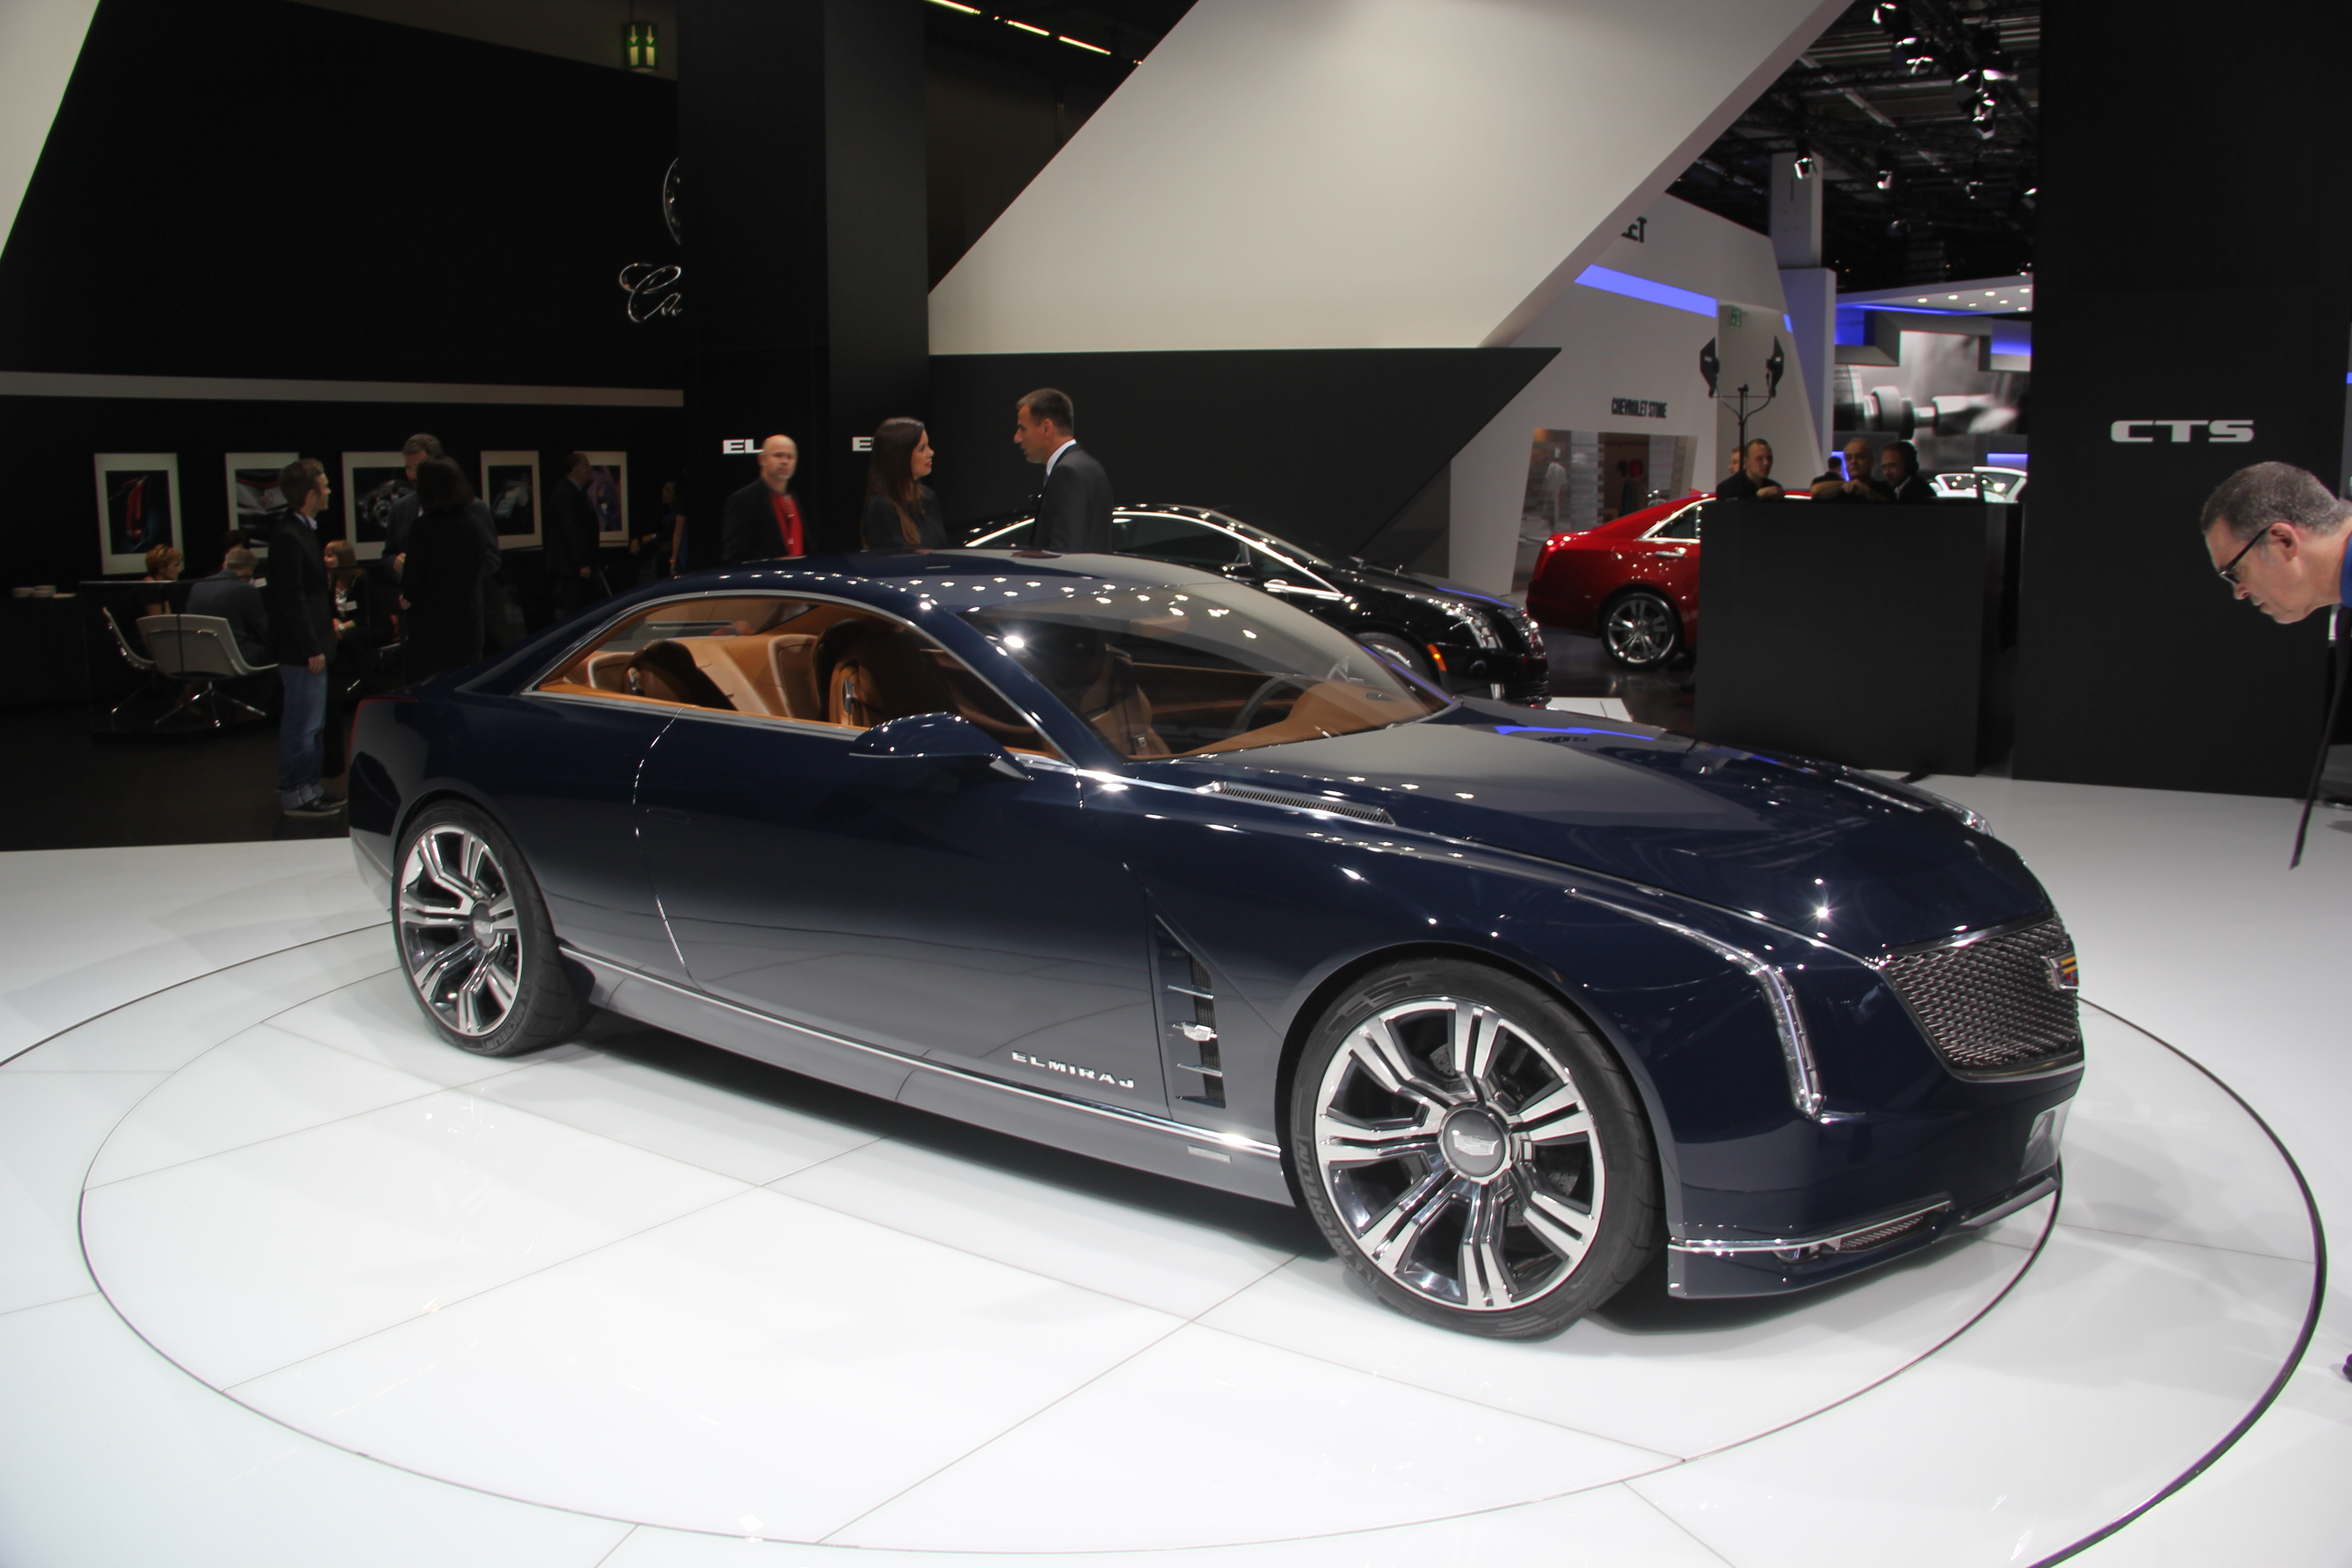 http://images.caradisiac.com/images/8/9/3/4/88934/S0-En-direct-du-salon-de-Francfort-2013-Cadillac-Concept-elmiraj-batmobile-302495.jpg